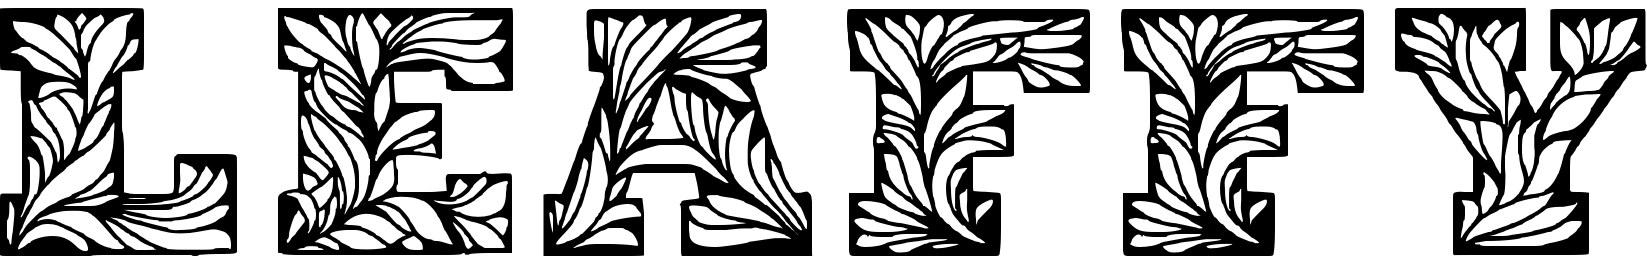 Leaffy